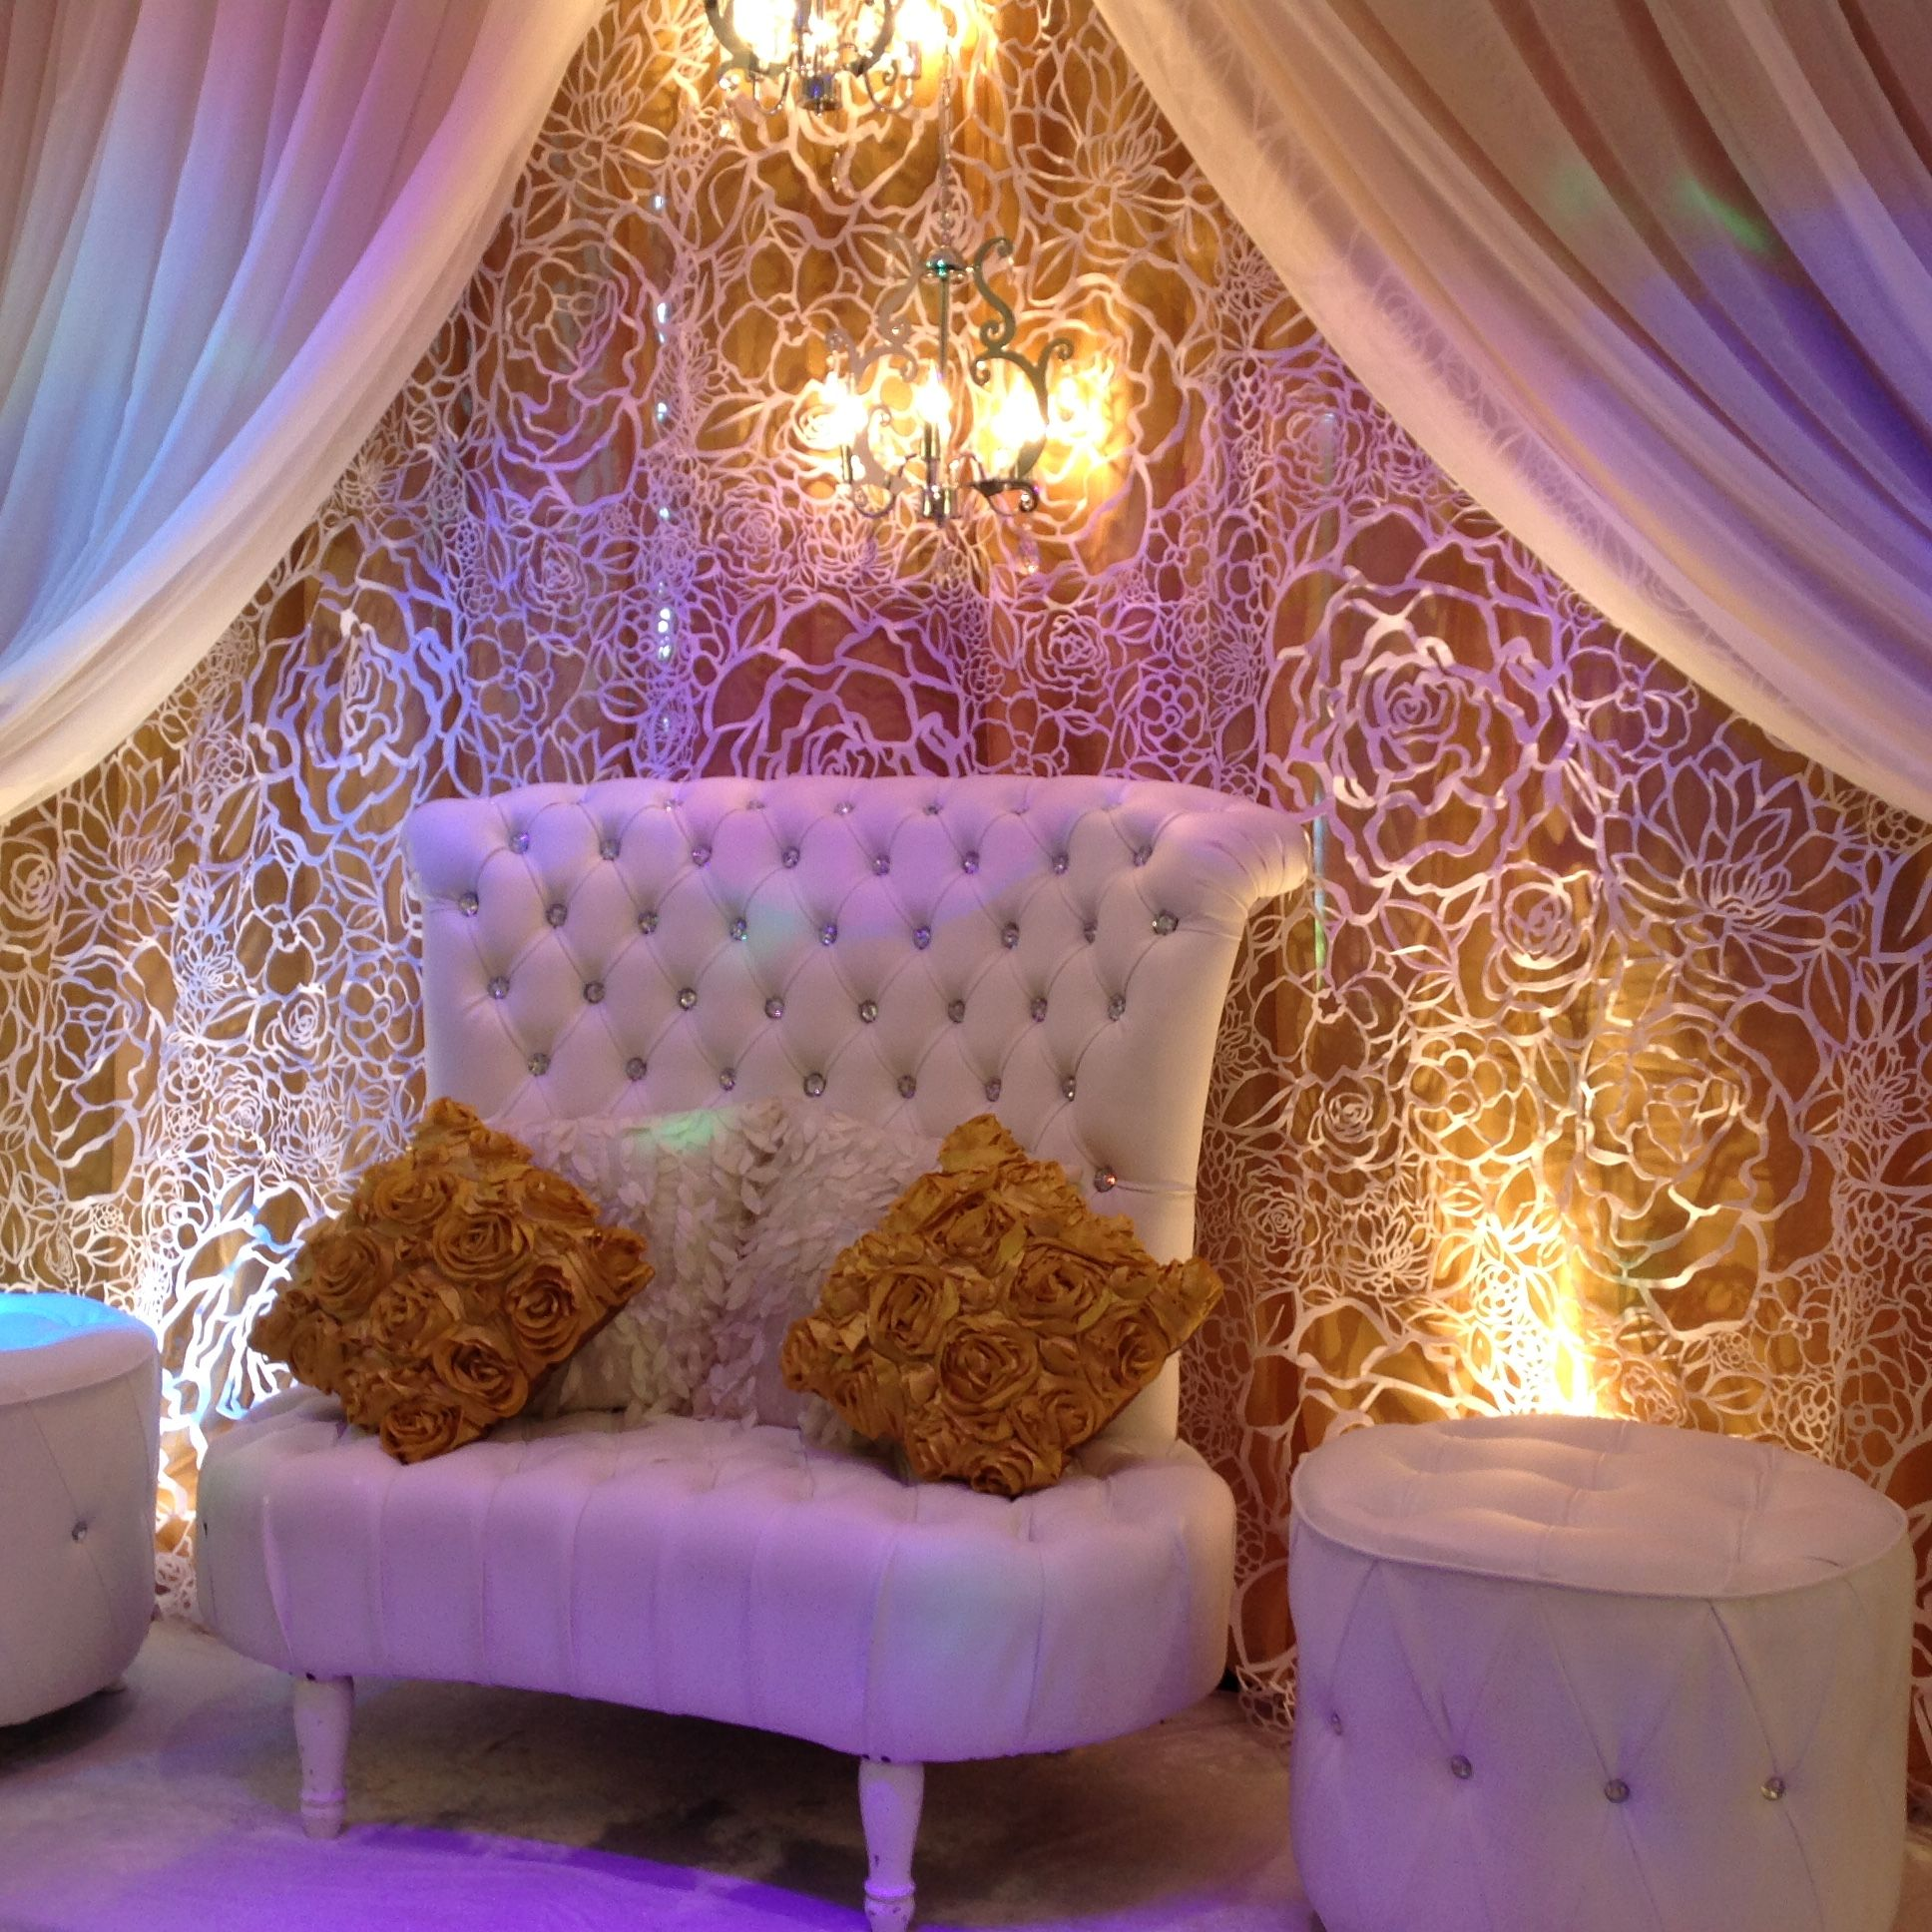 Wedding Royal Golden Throne Set Dstexports